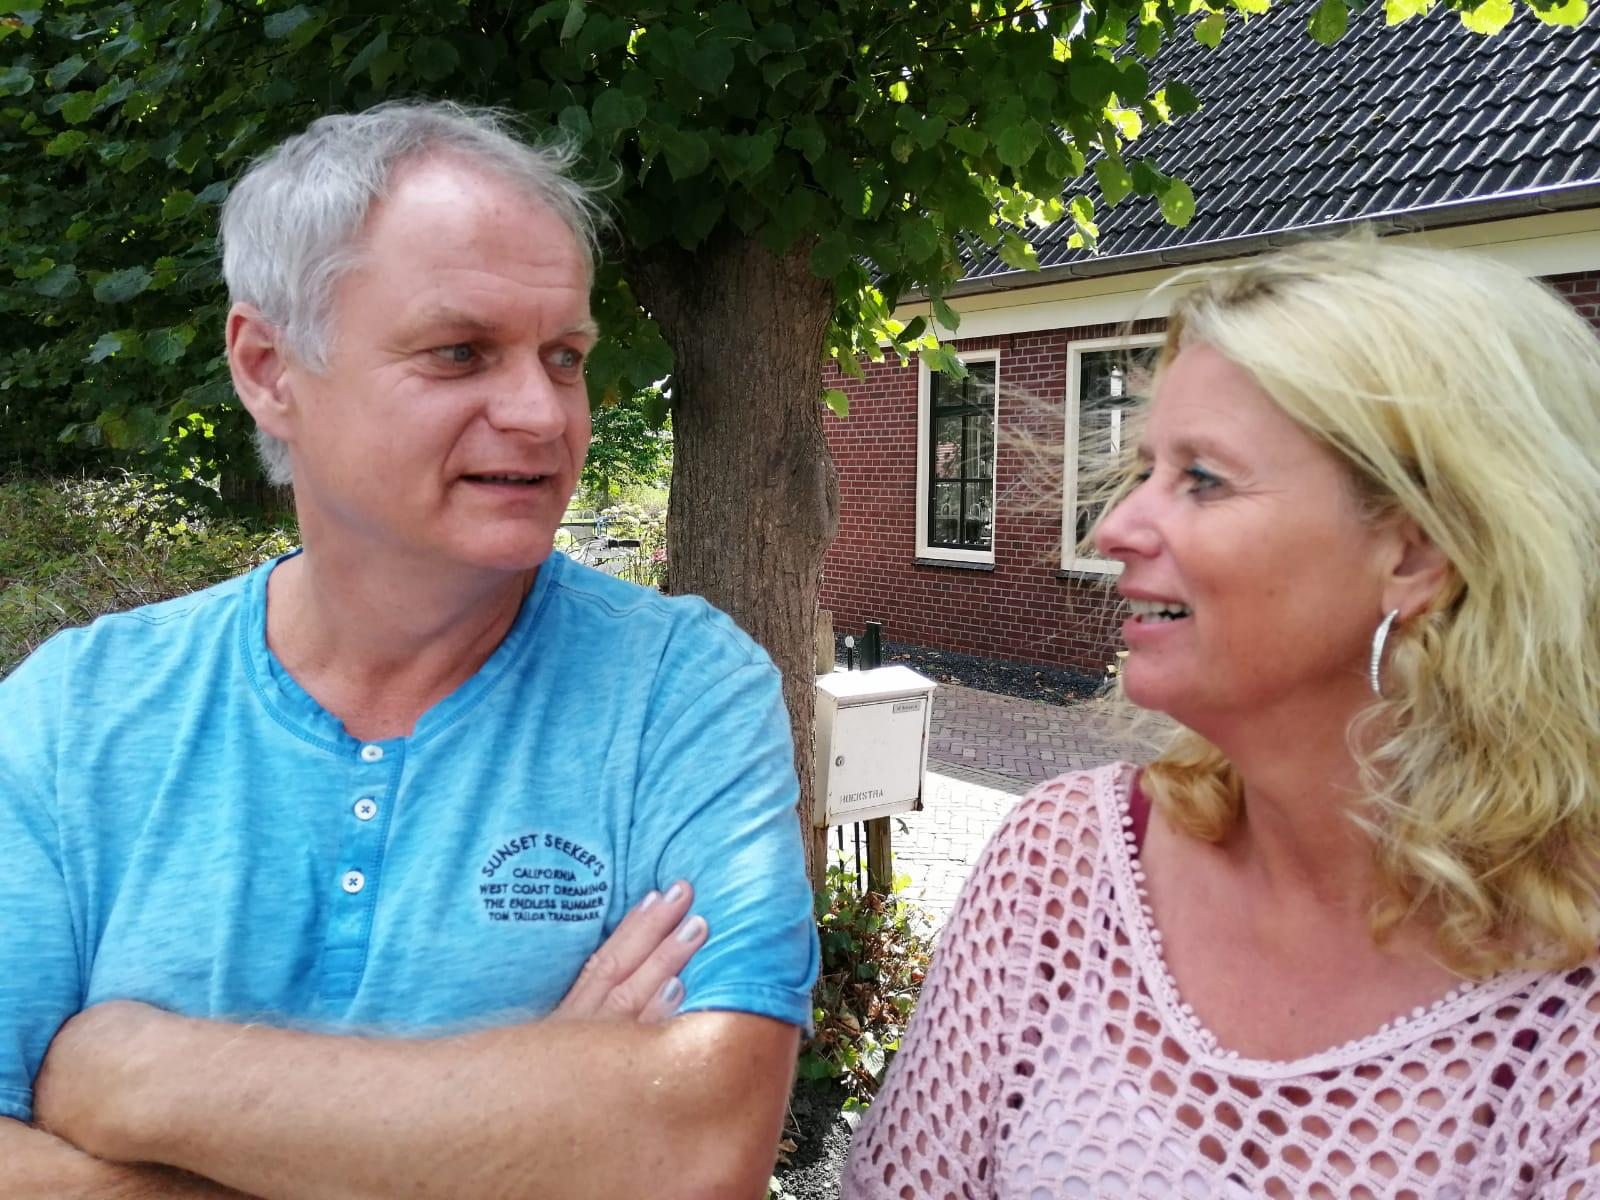 Aardbevingscoaches Melanie en Jodi